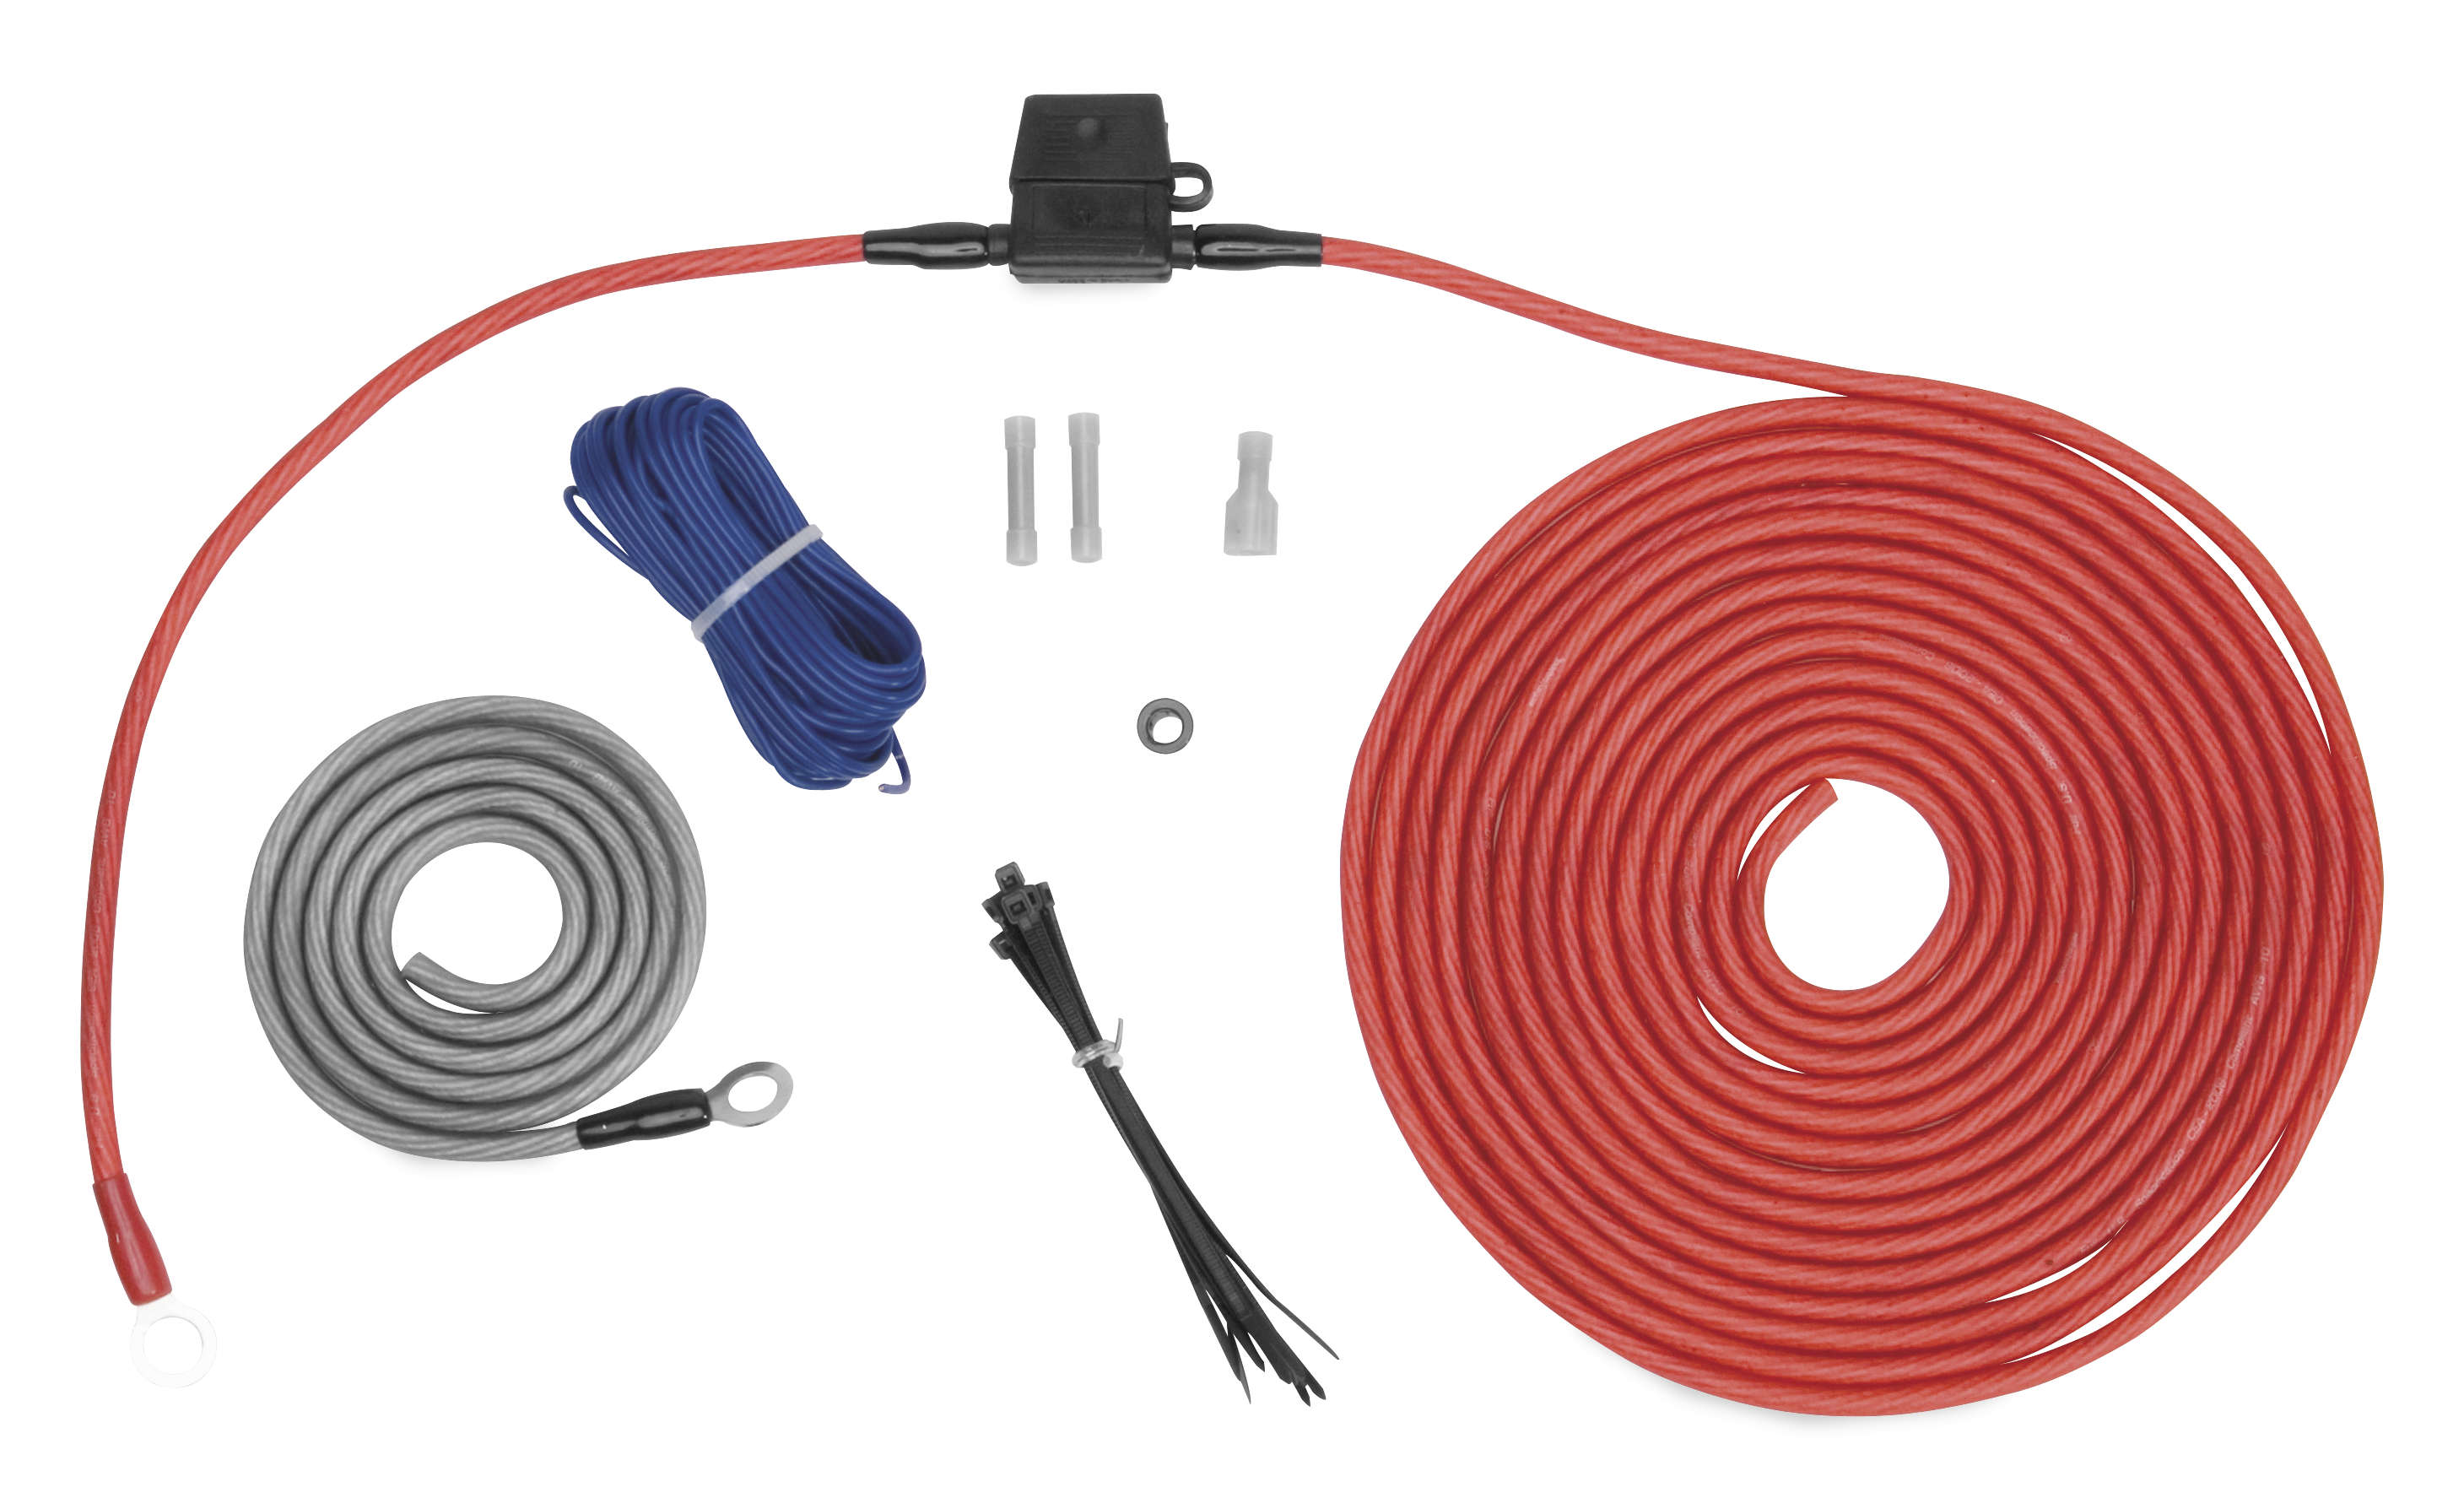 ROCKFORD FOSGATE 10 AWG Power Installation Kit